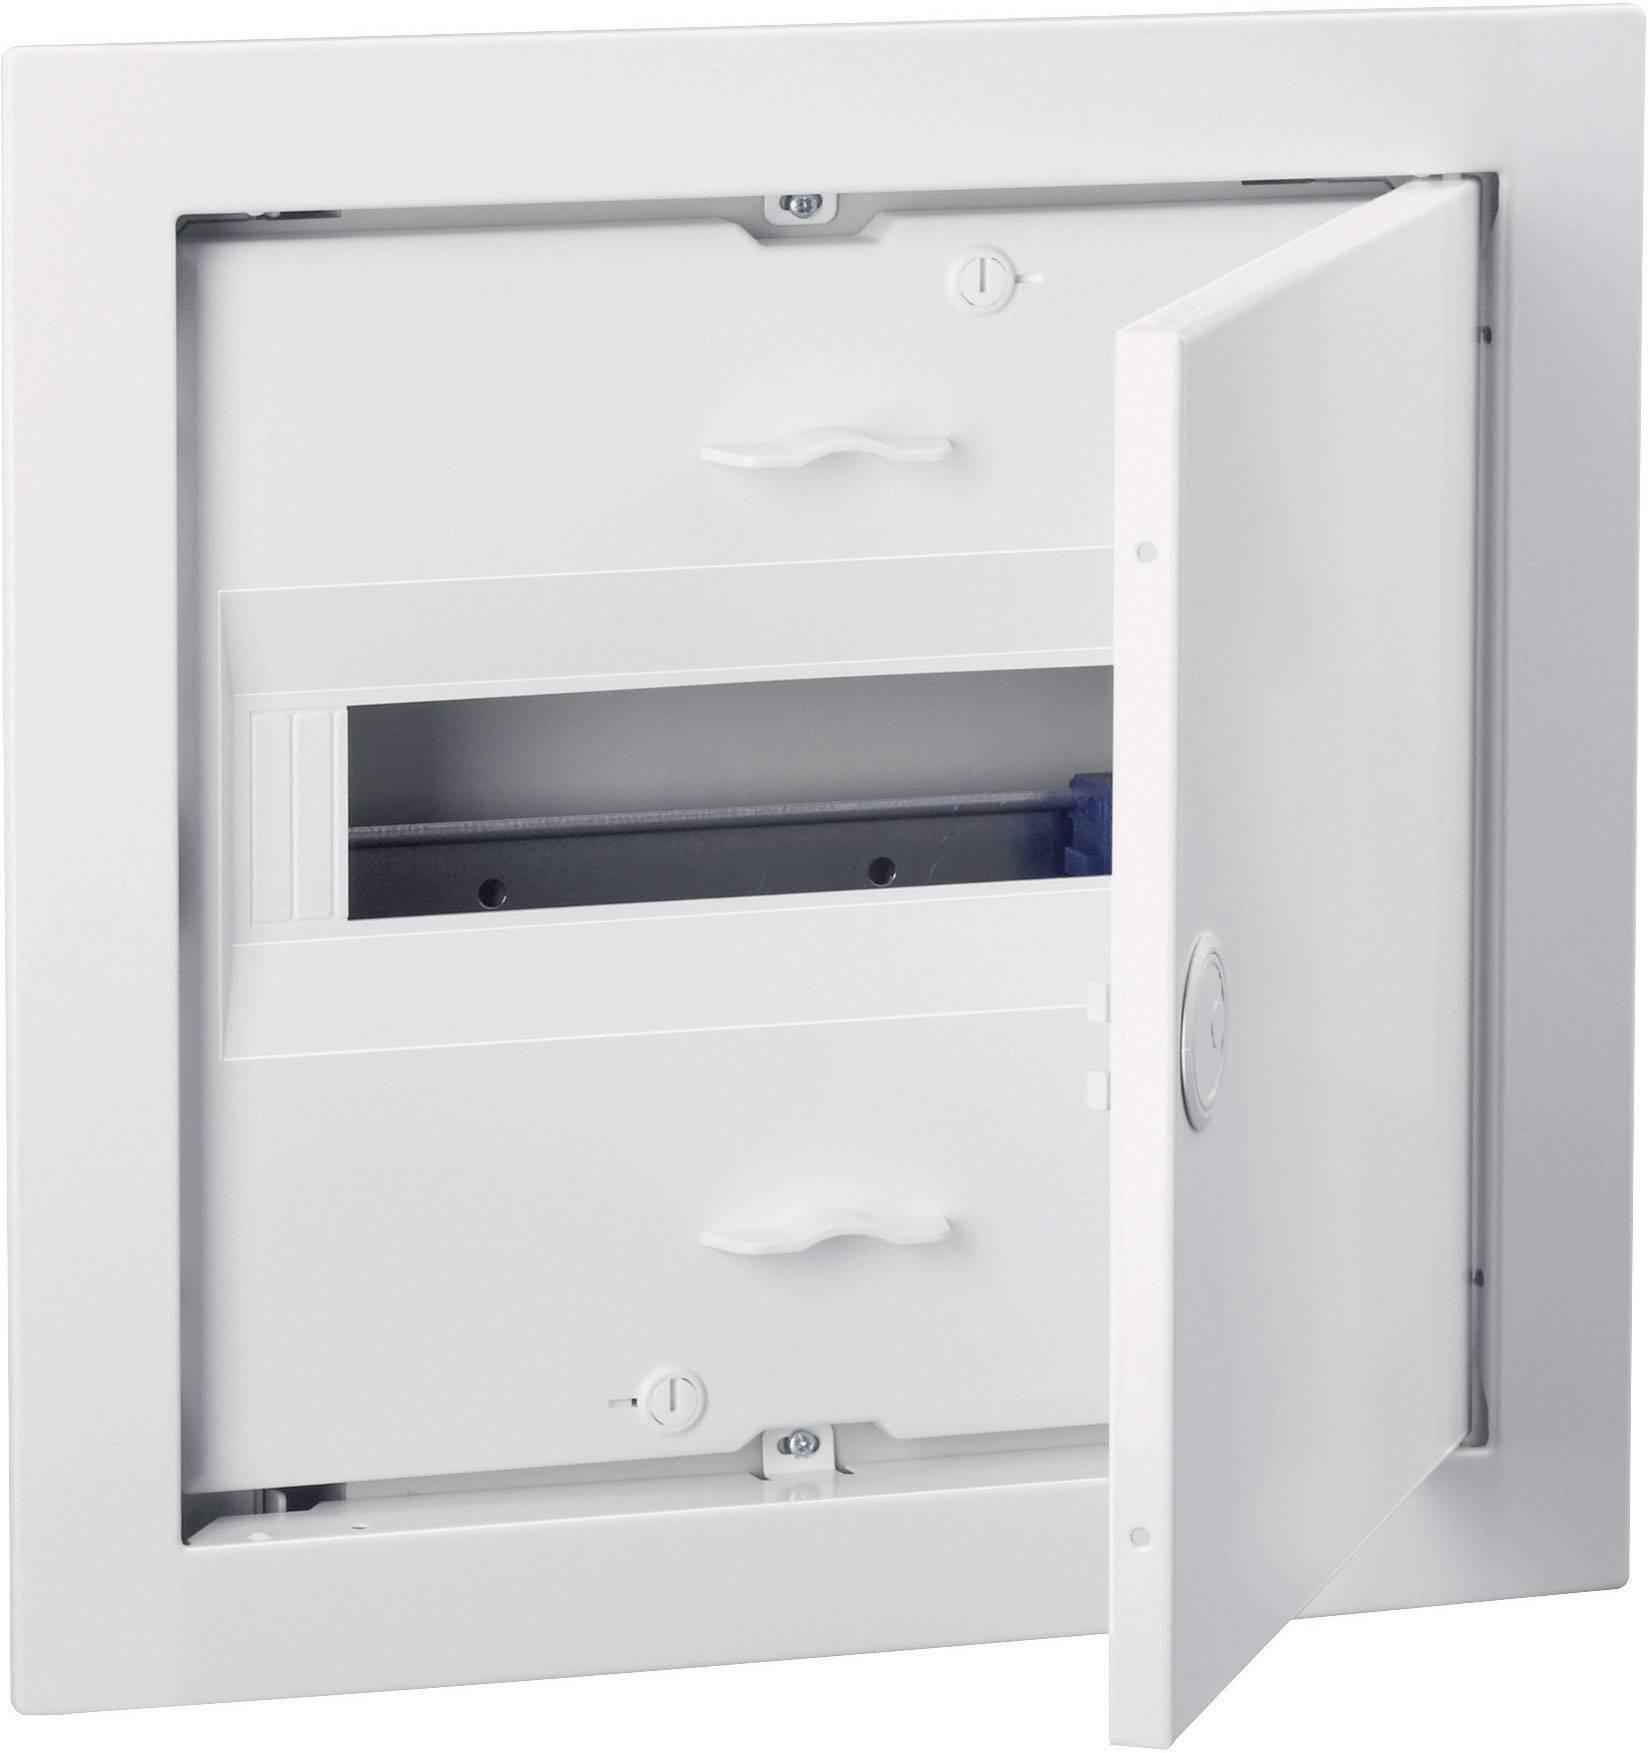 1řadá rozvodná skříň Striebel & John pod omítku, 12 modulů, IP30, UK512N2